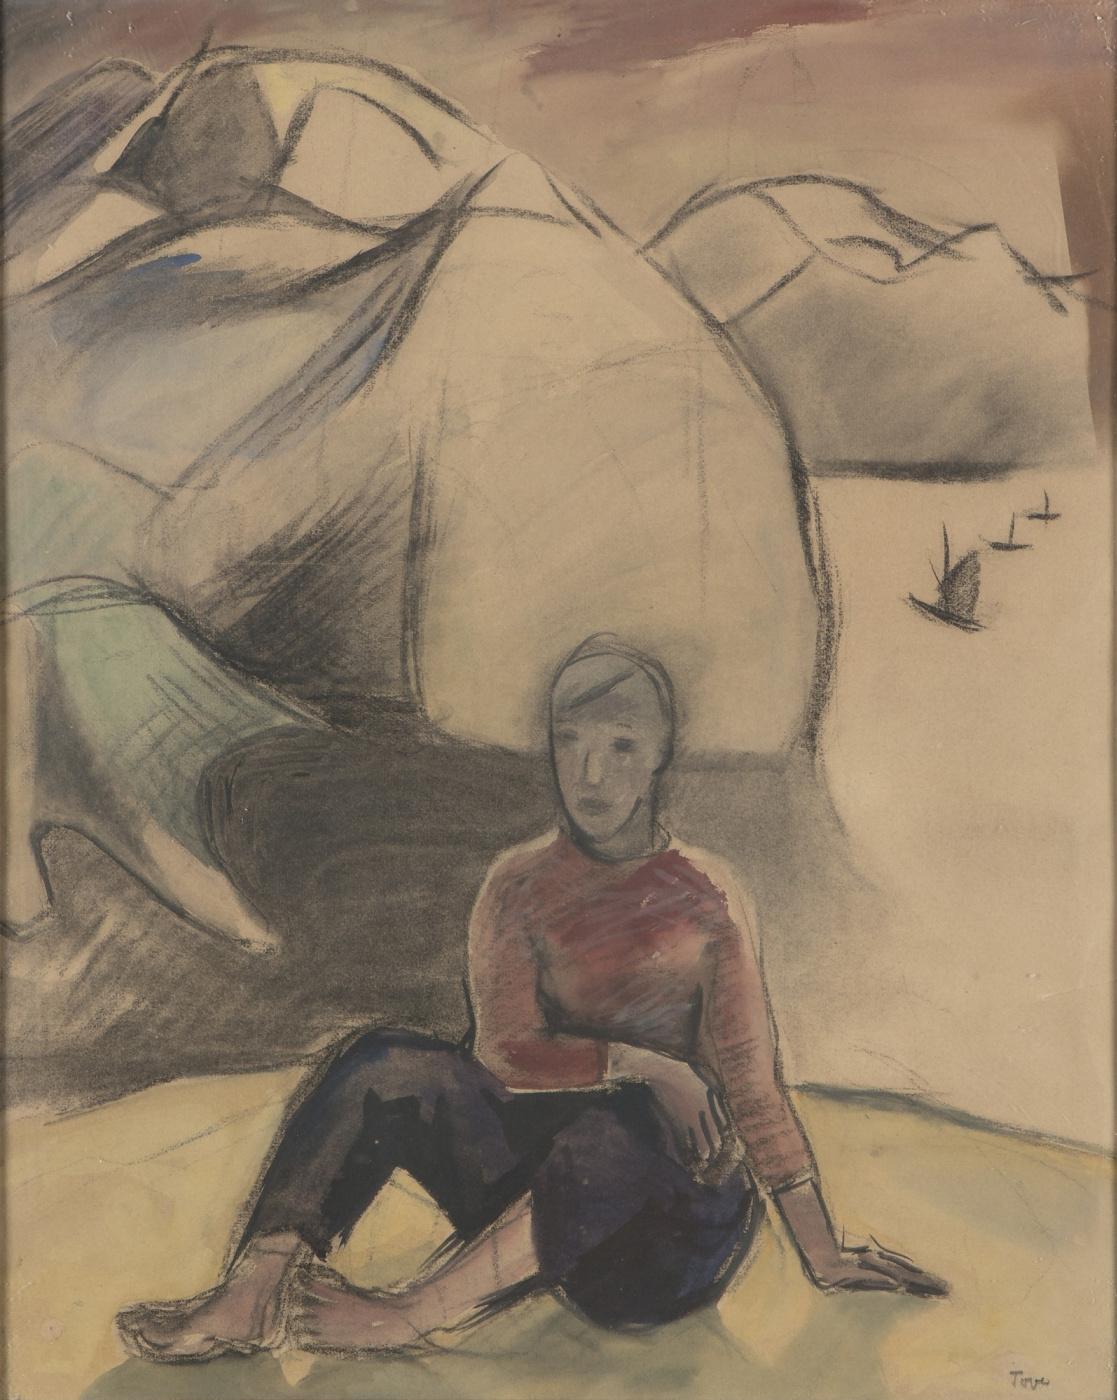 Tove Jansson. Girl on the beach